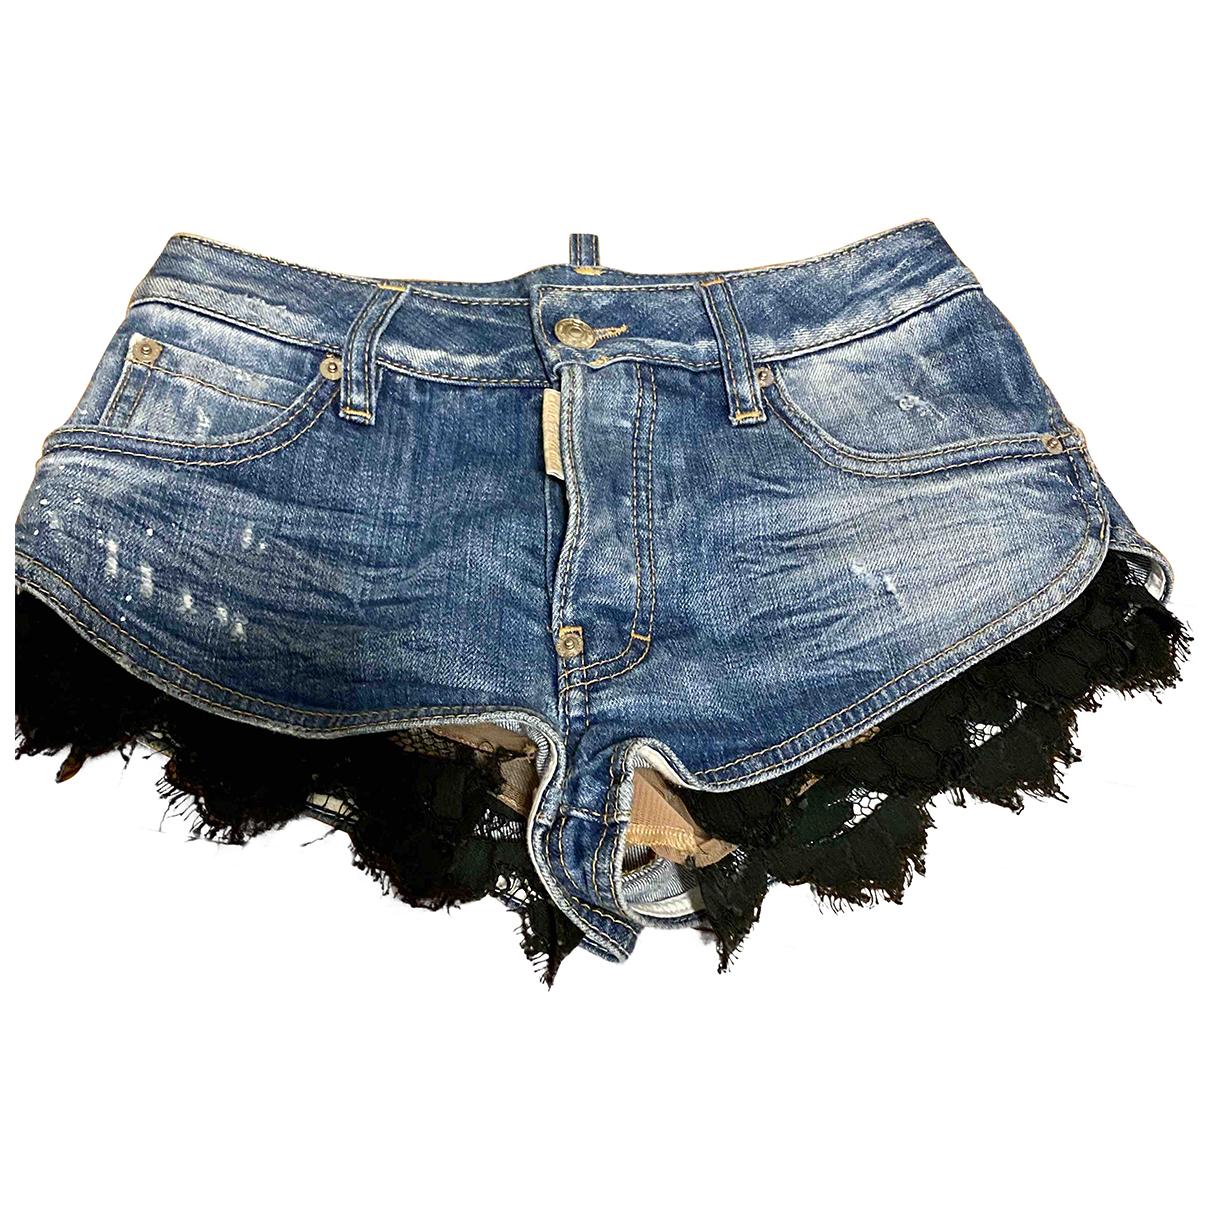 Dsquared2 \N Blue Denim - Jeans Shorts for Women 38 IT